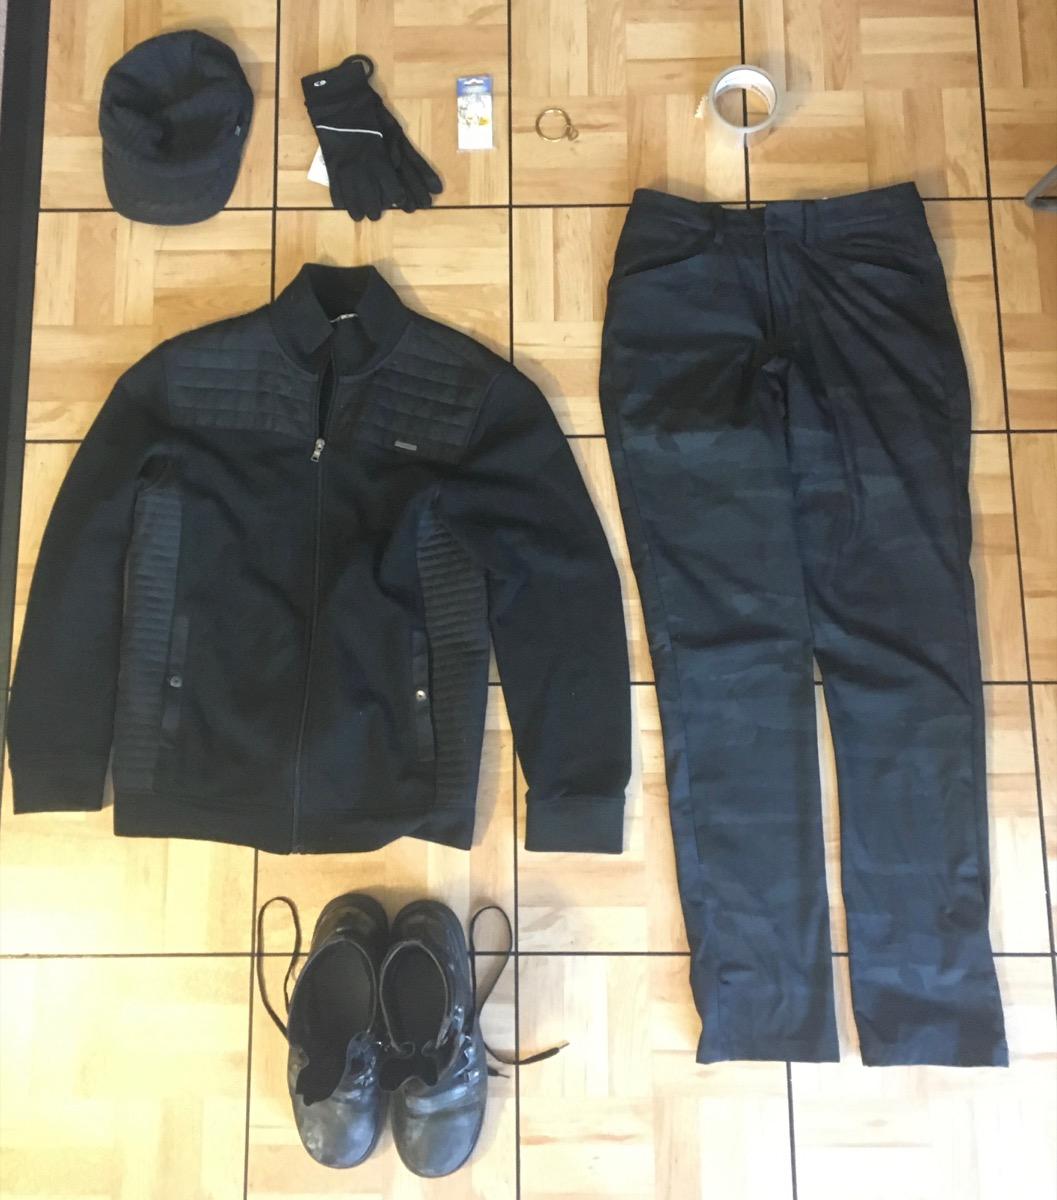 Costume materials copy-1200